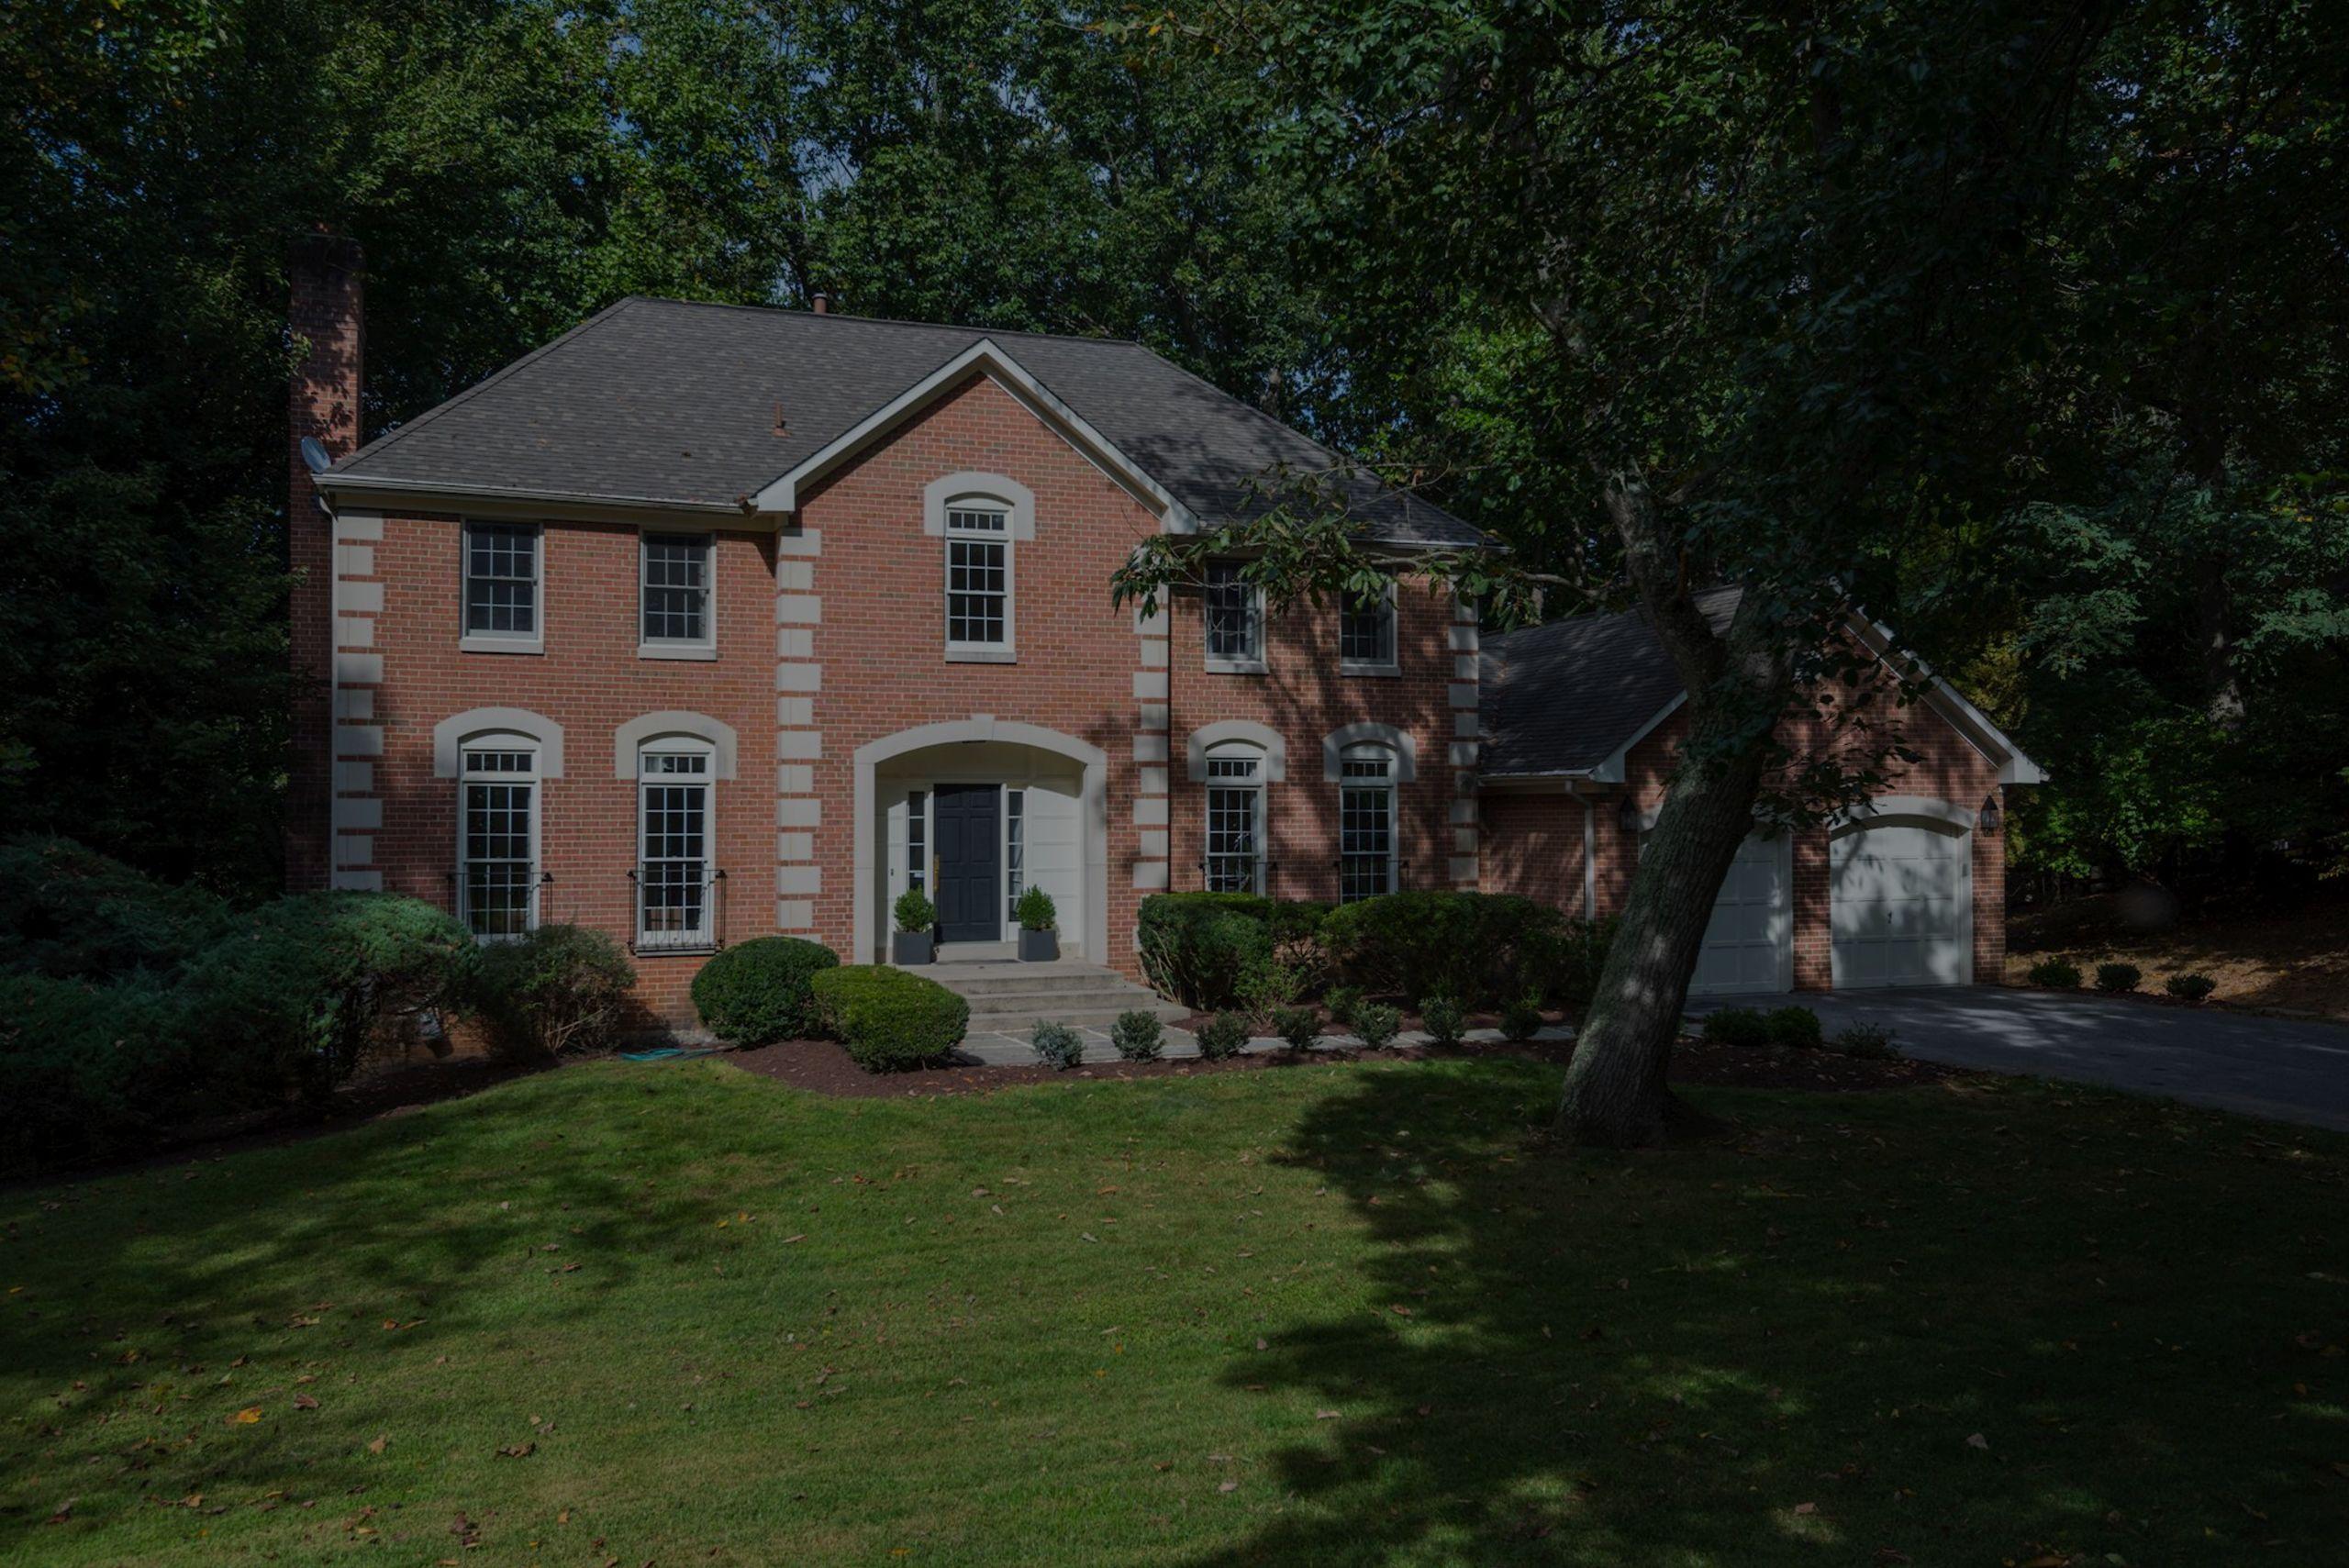 Sold: 9216 Vendome Drive, Potomac, MD